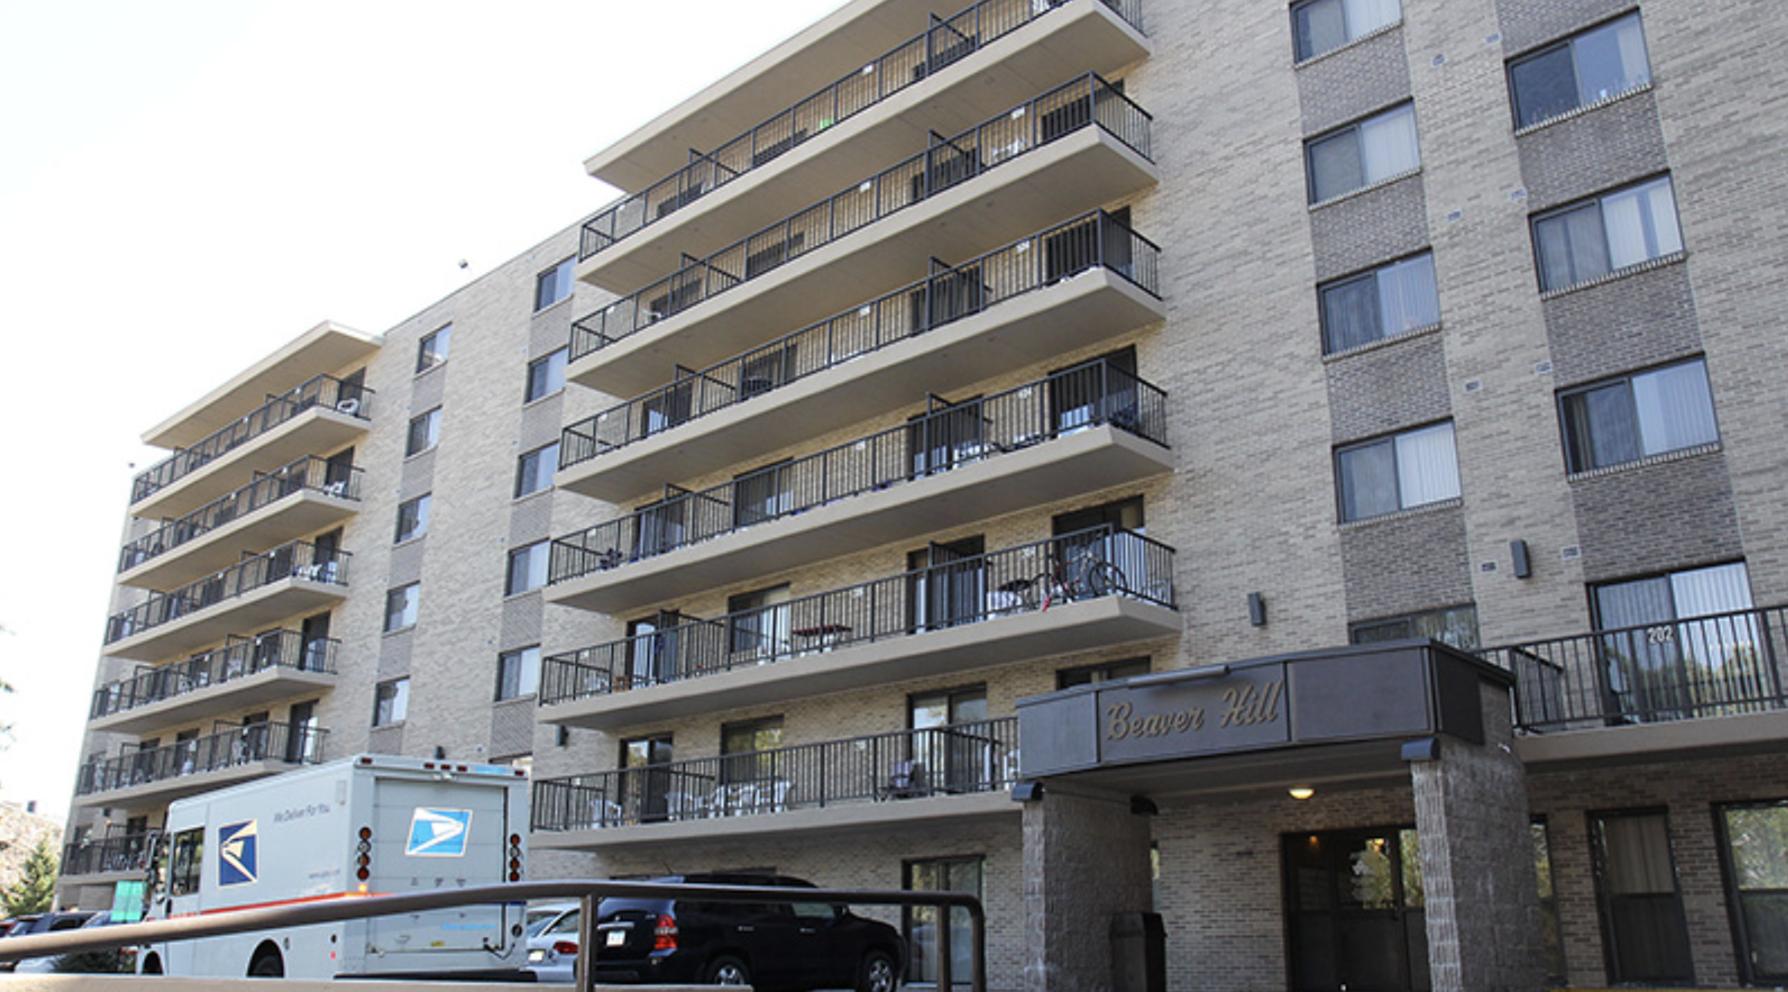 Beaver Hill Apartments